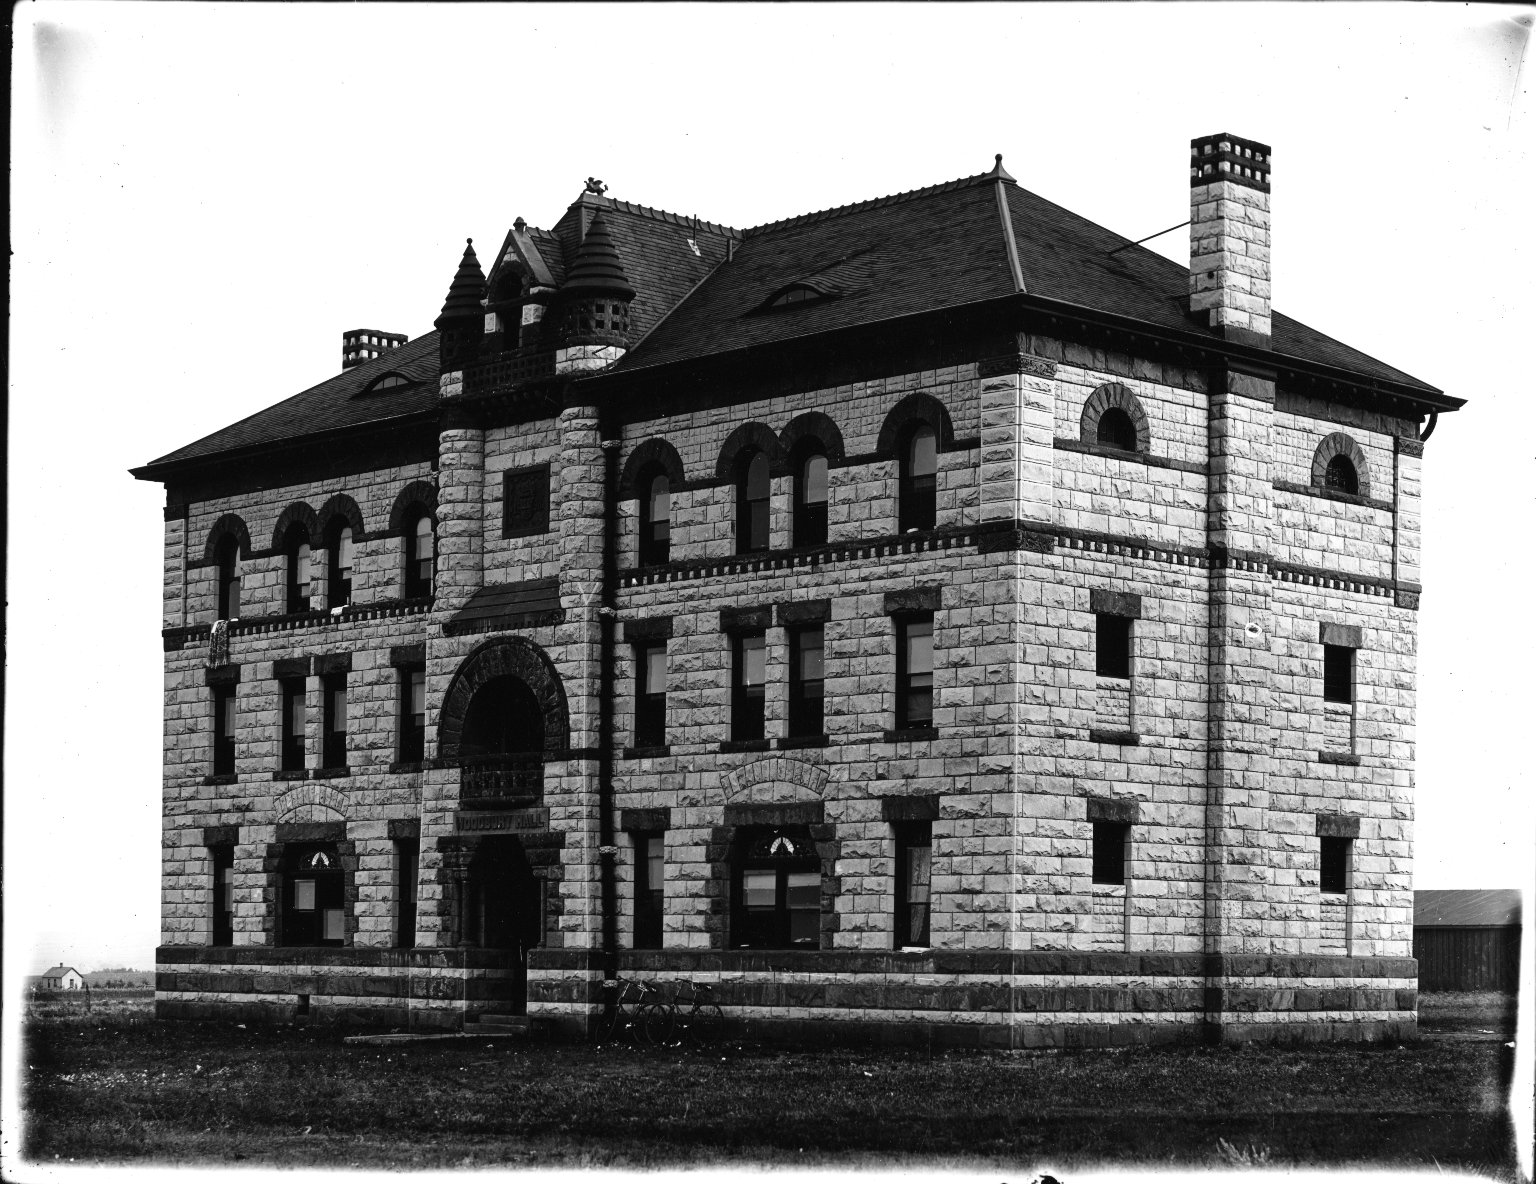 Woodbury I, Property of J.R.B. Univ. of Colo.